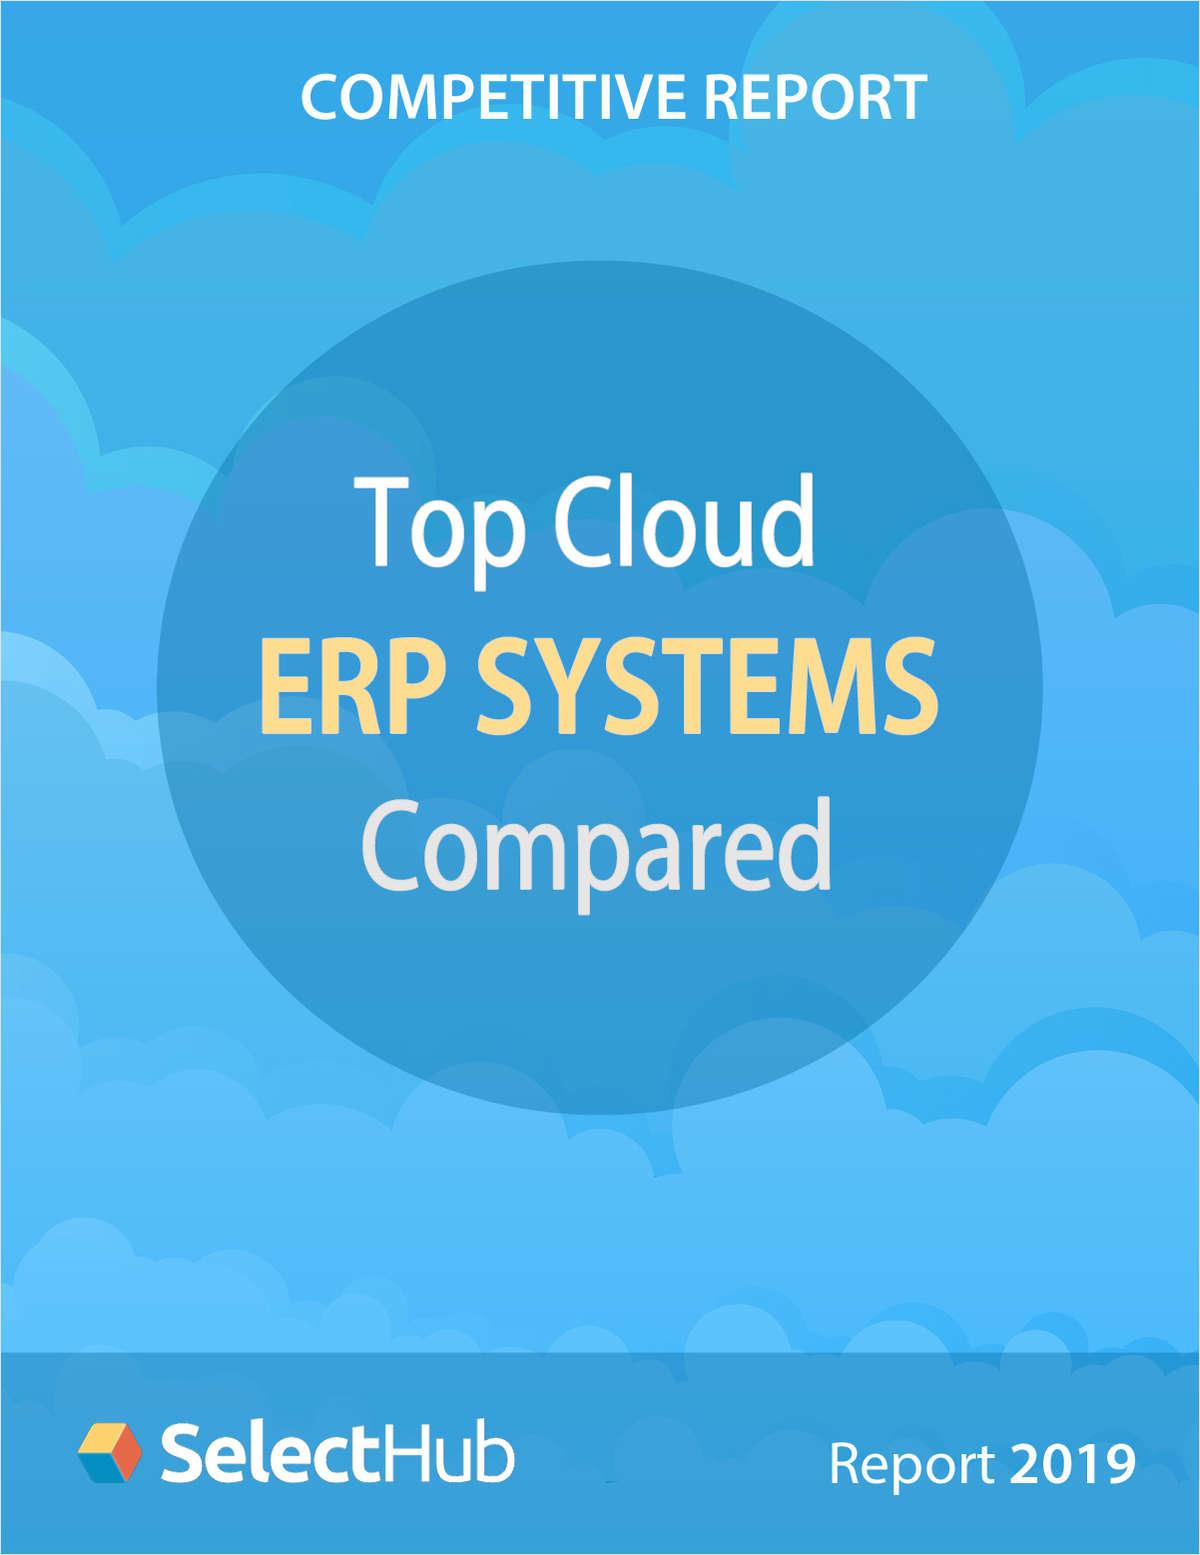 Top Cloud ERP System Comparison for 2019